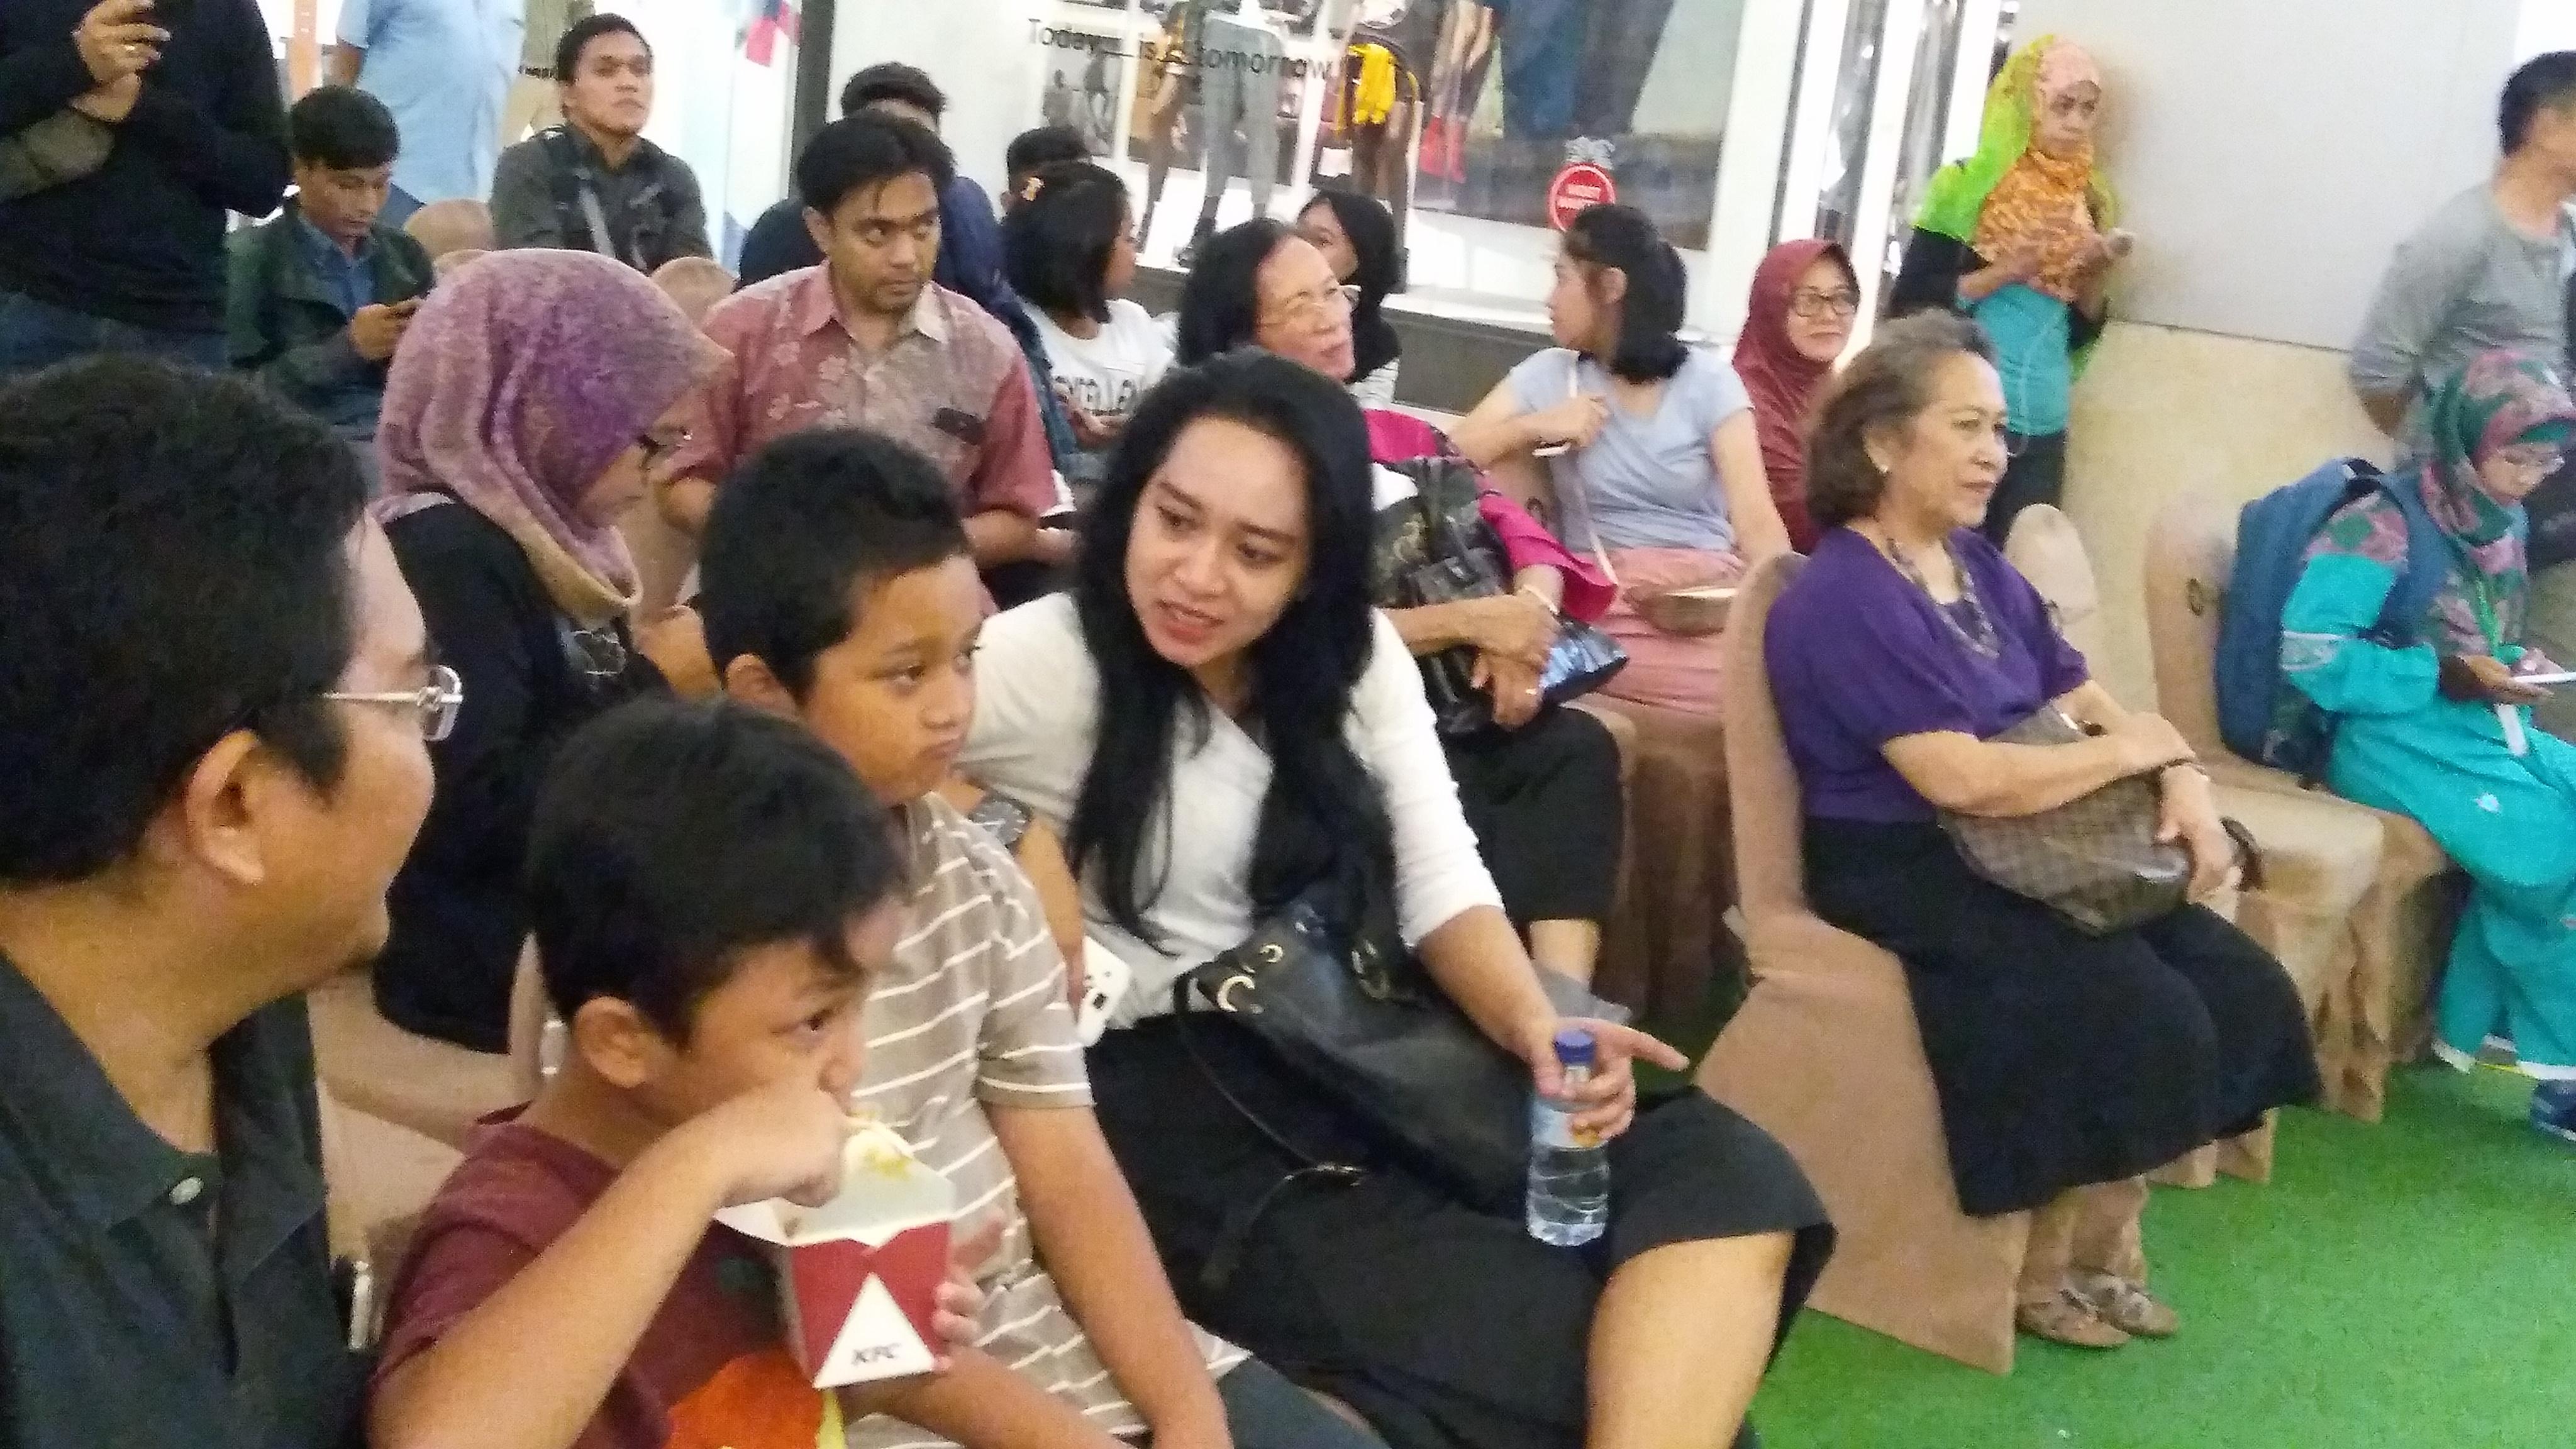 Zahran bersama keluarganya datang ke pameran pendidikan ini.(foto.: Nur Terbit)